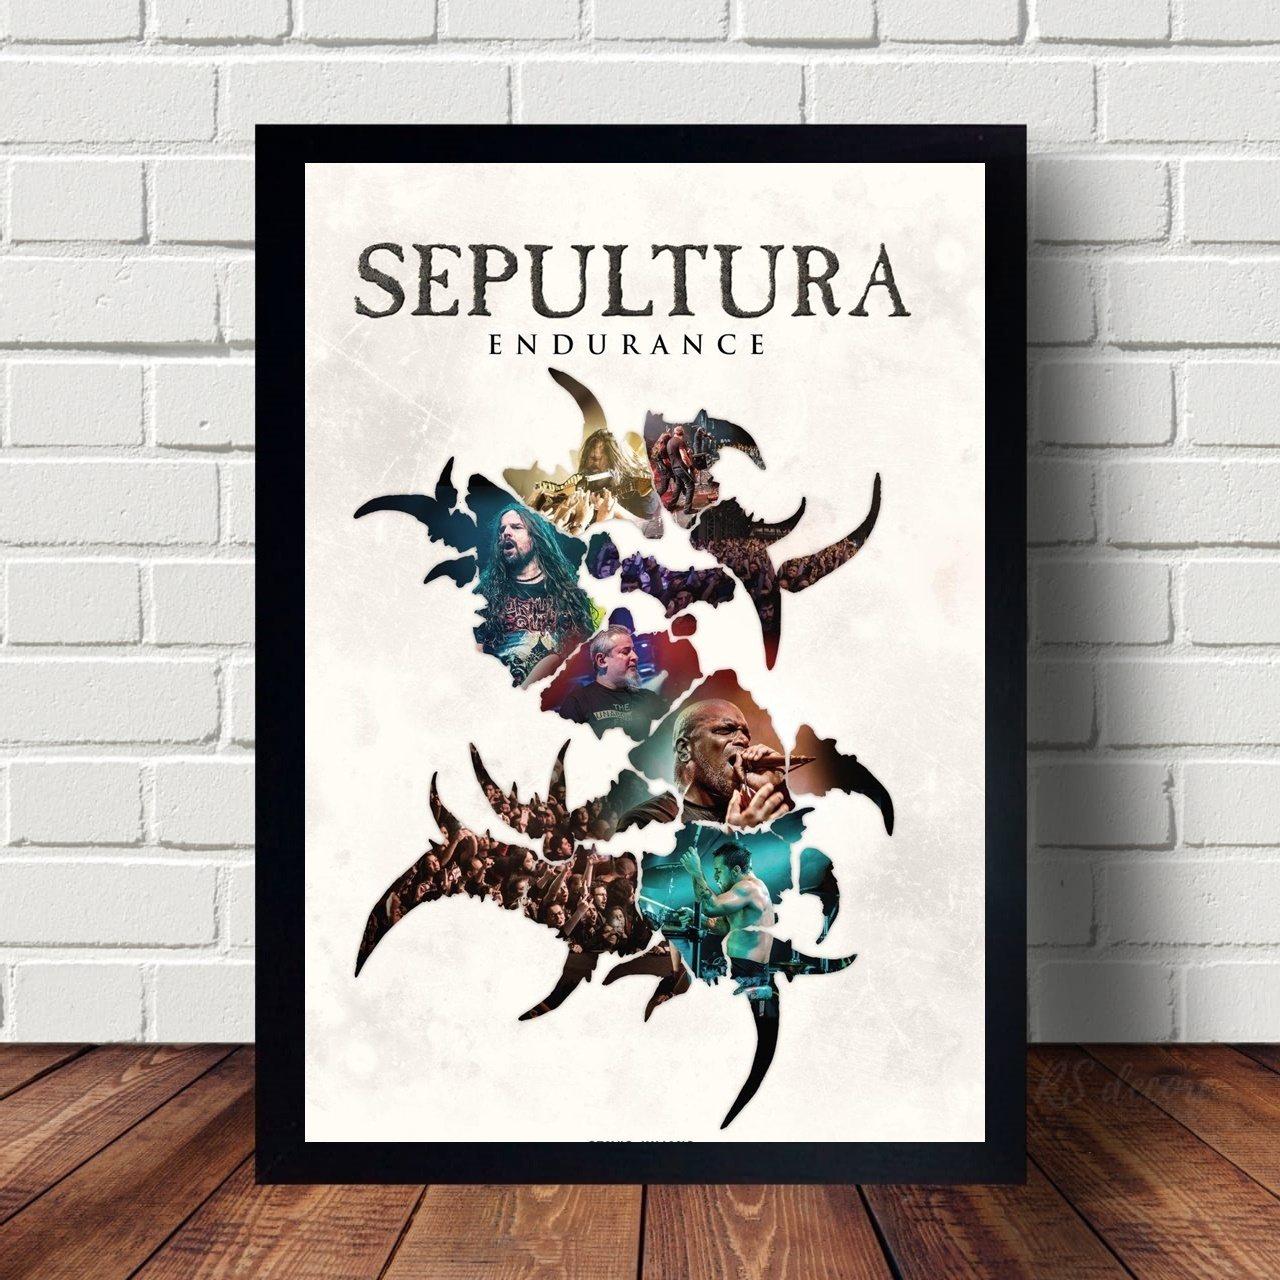 Quadro Decorativo Sepultura III